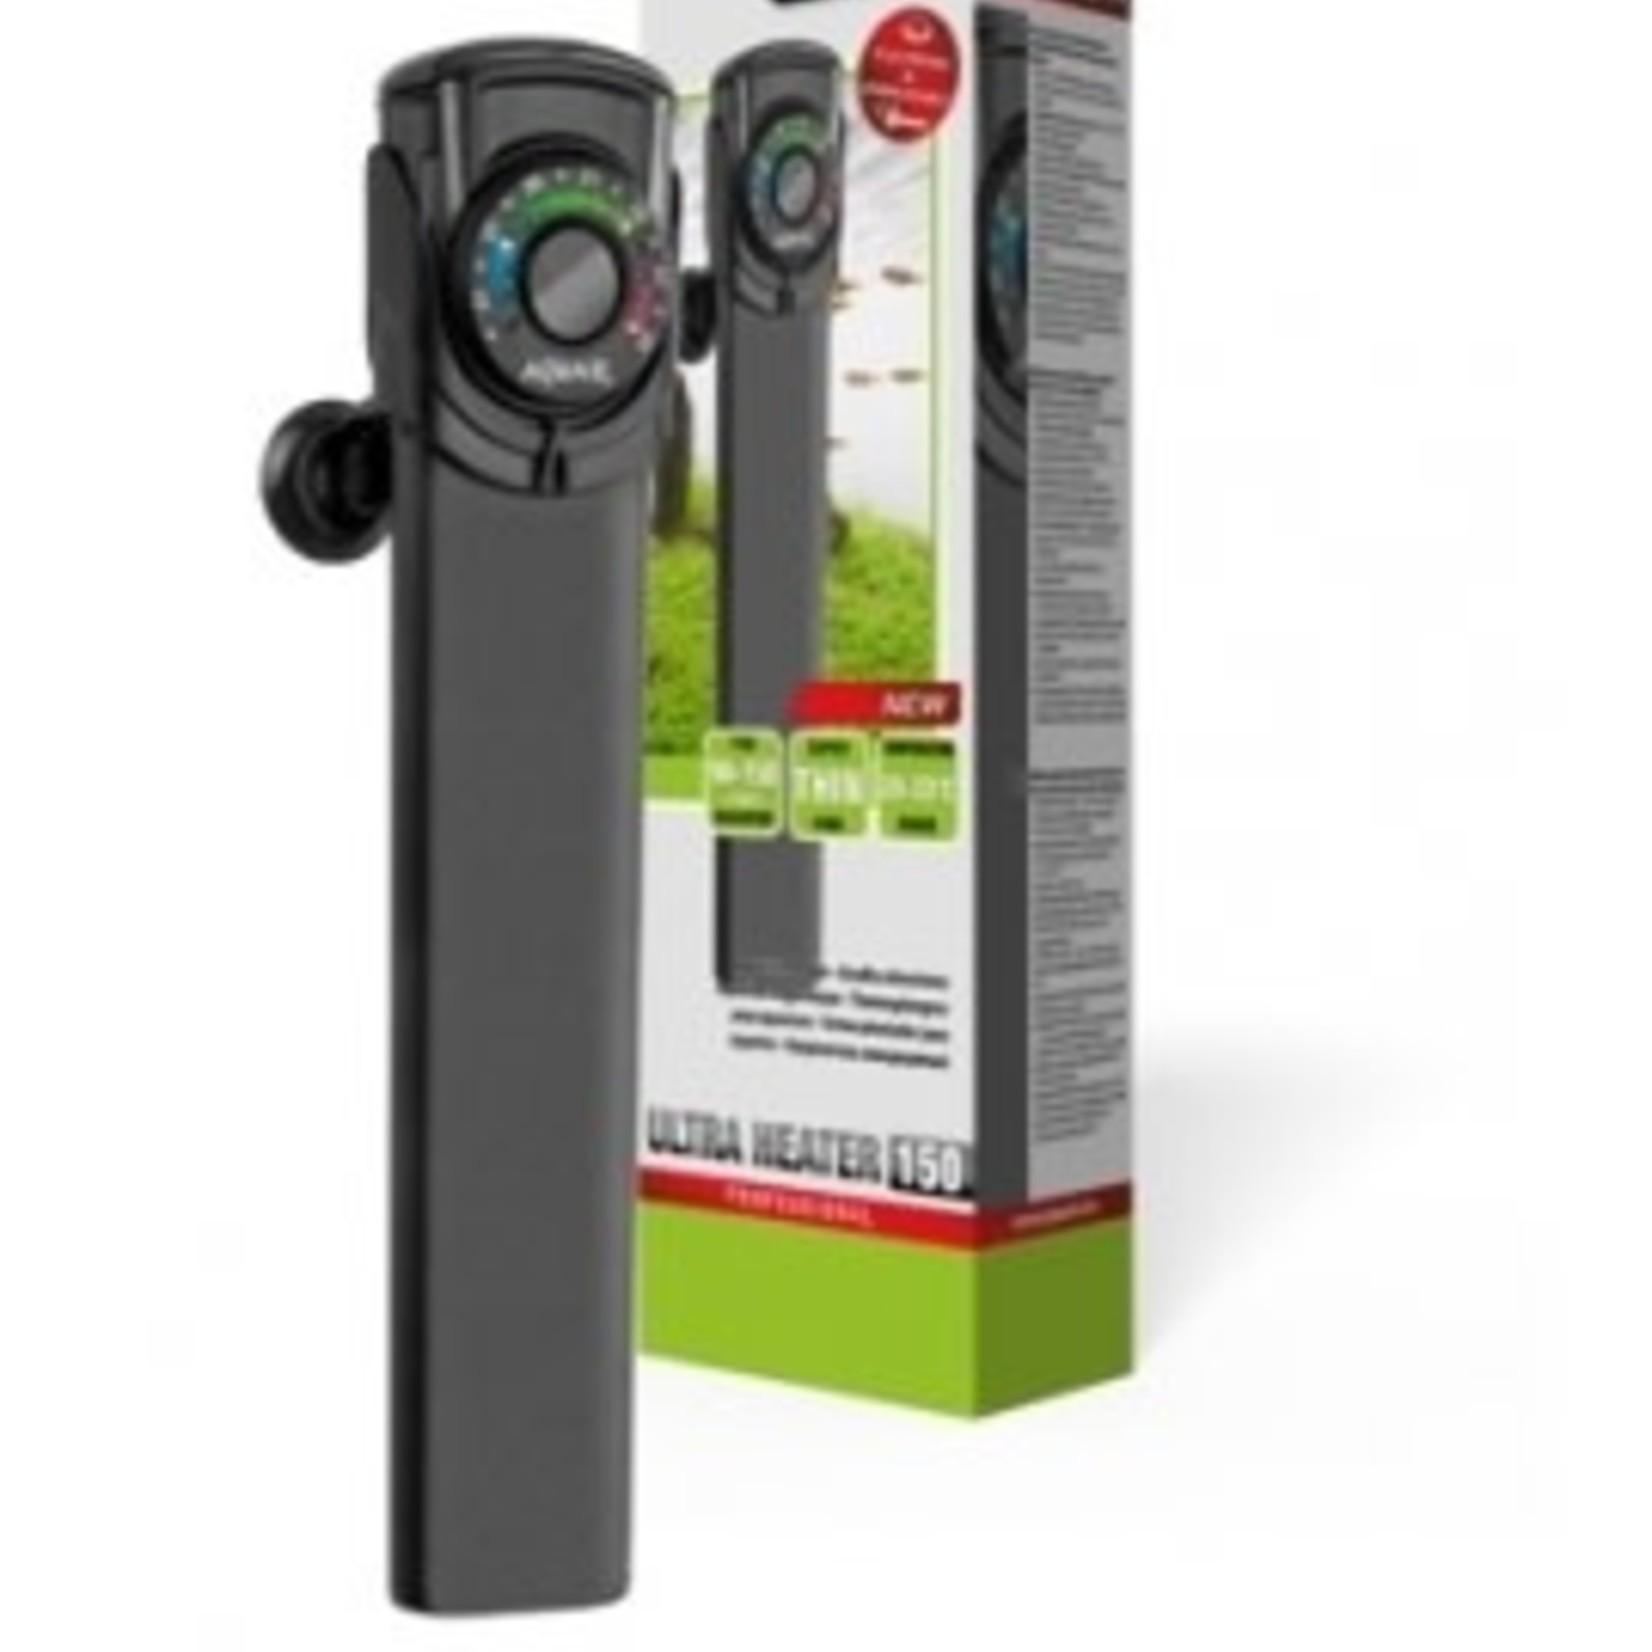 AquaEl Chauffage Incassable Ultra Heater